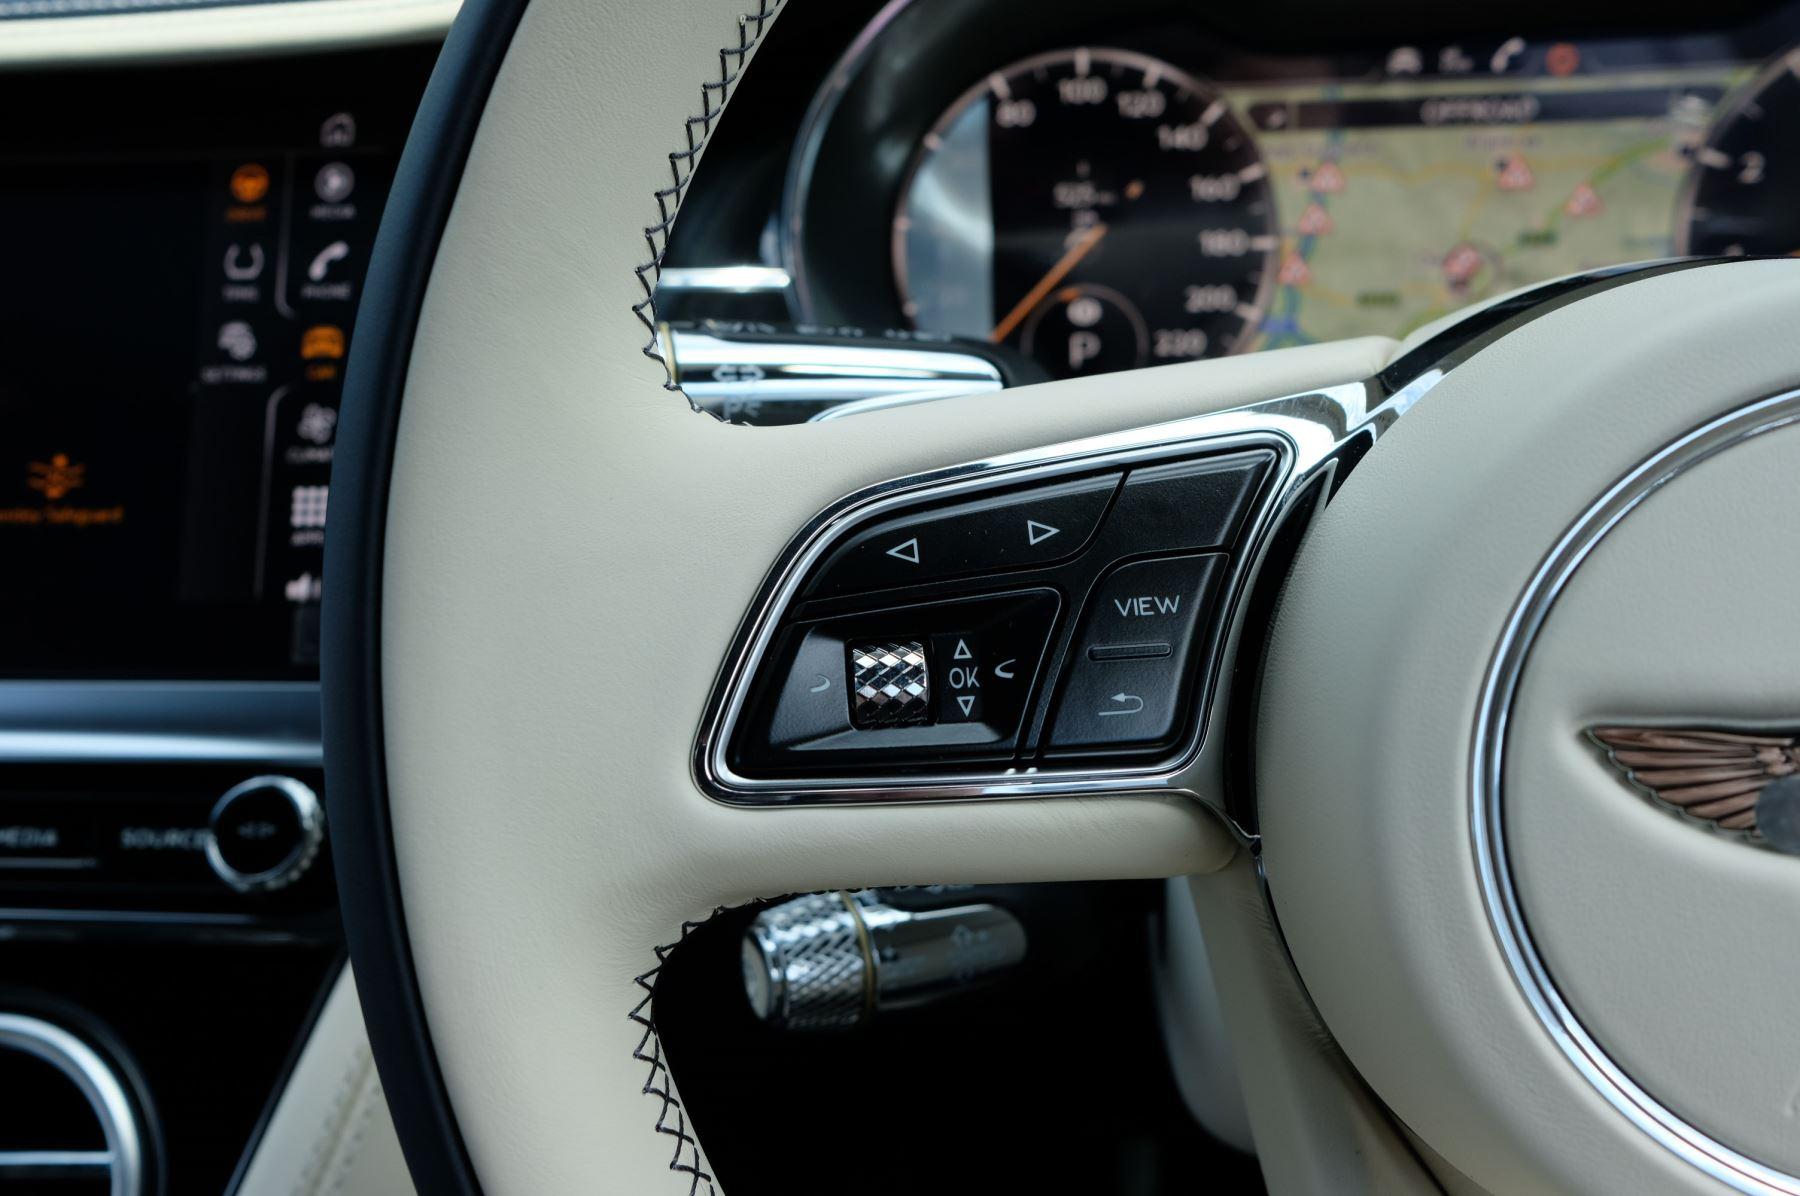 Bentley Continental GTC 4.0 V8 Mulliner Edition 2dr Auto [Tour Spec] image 23